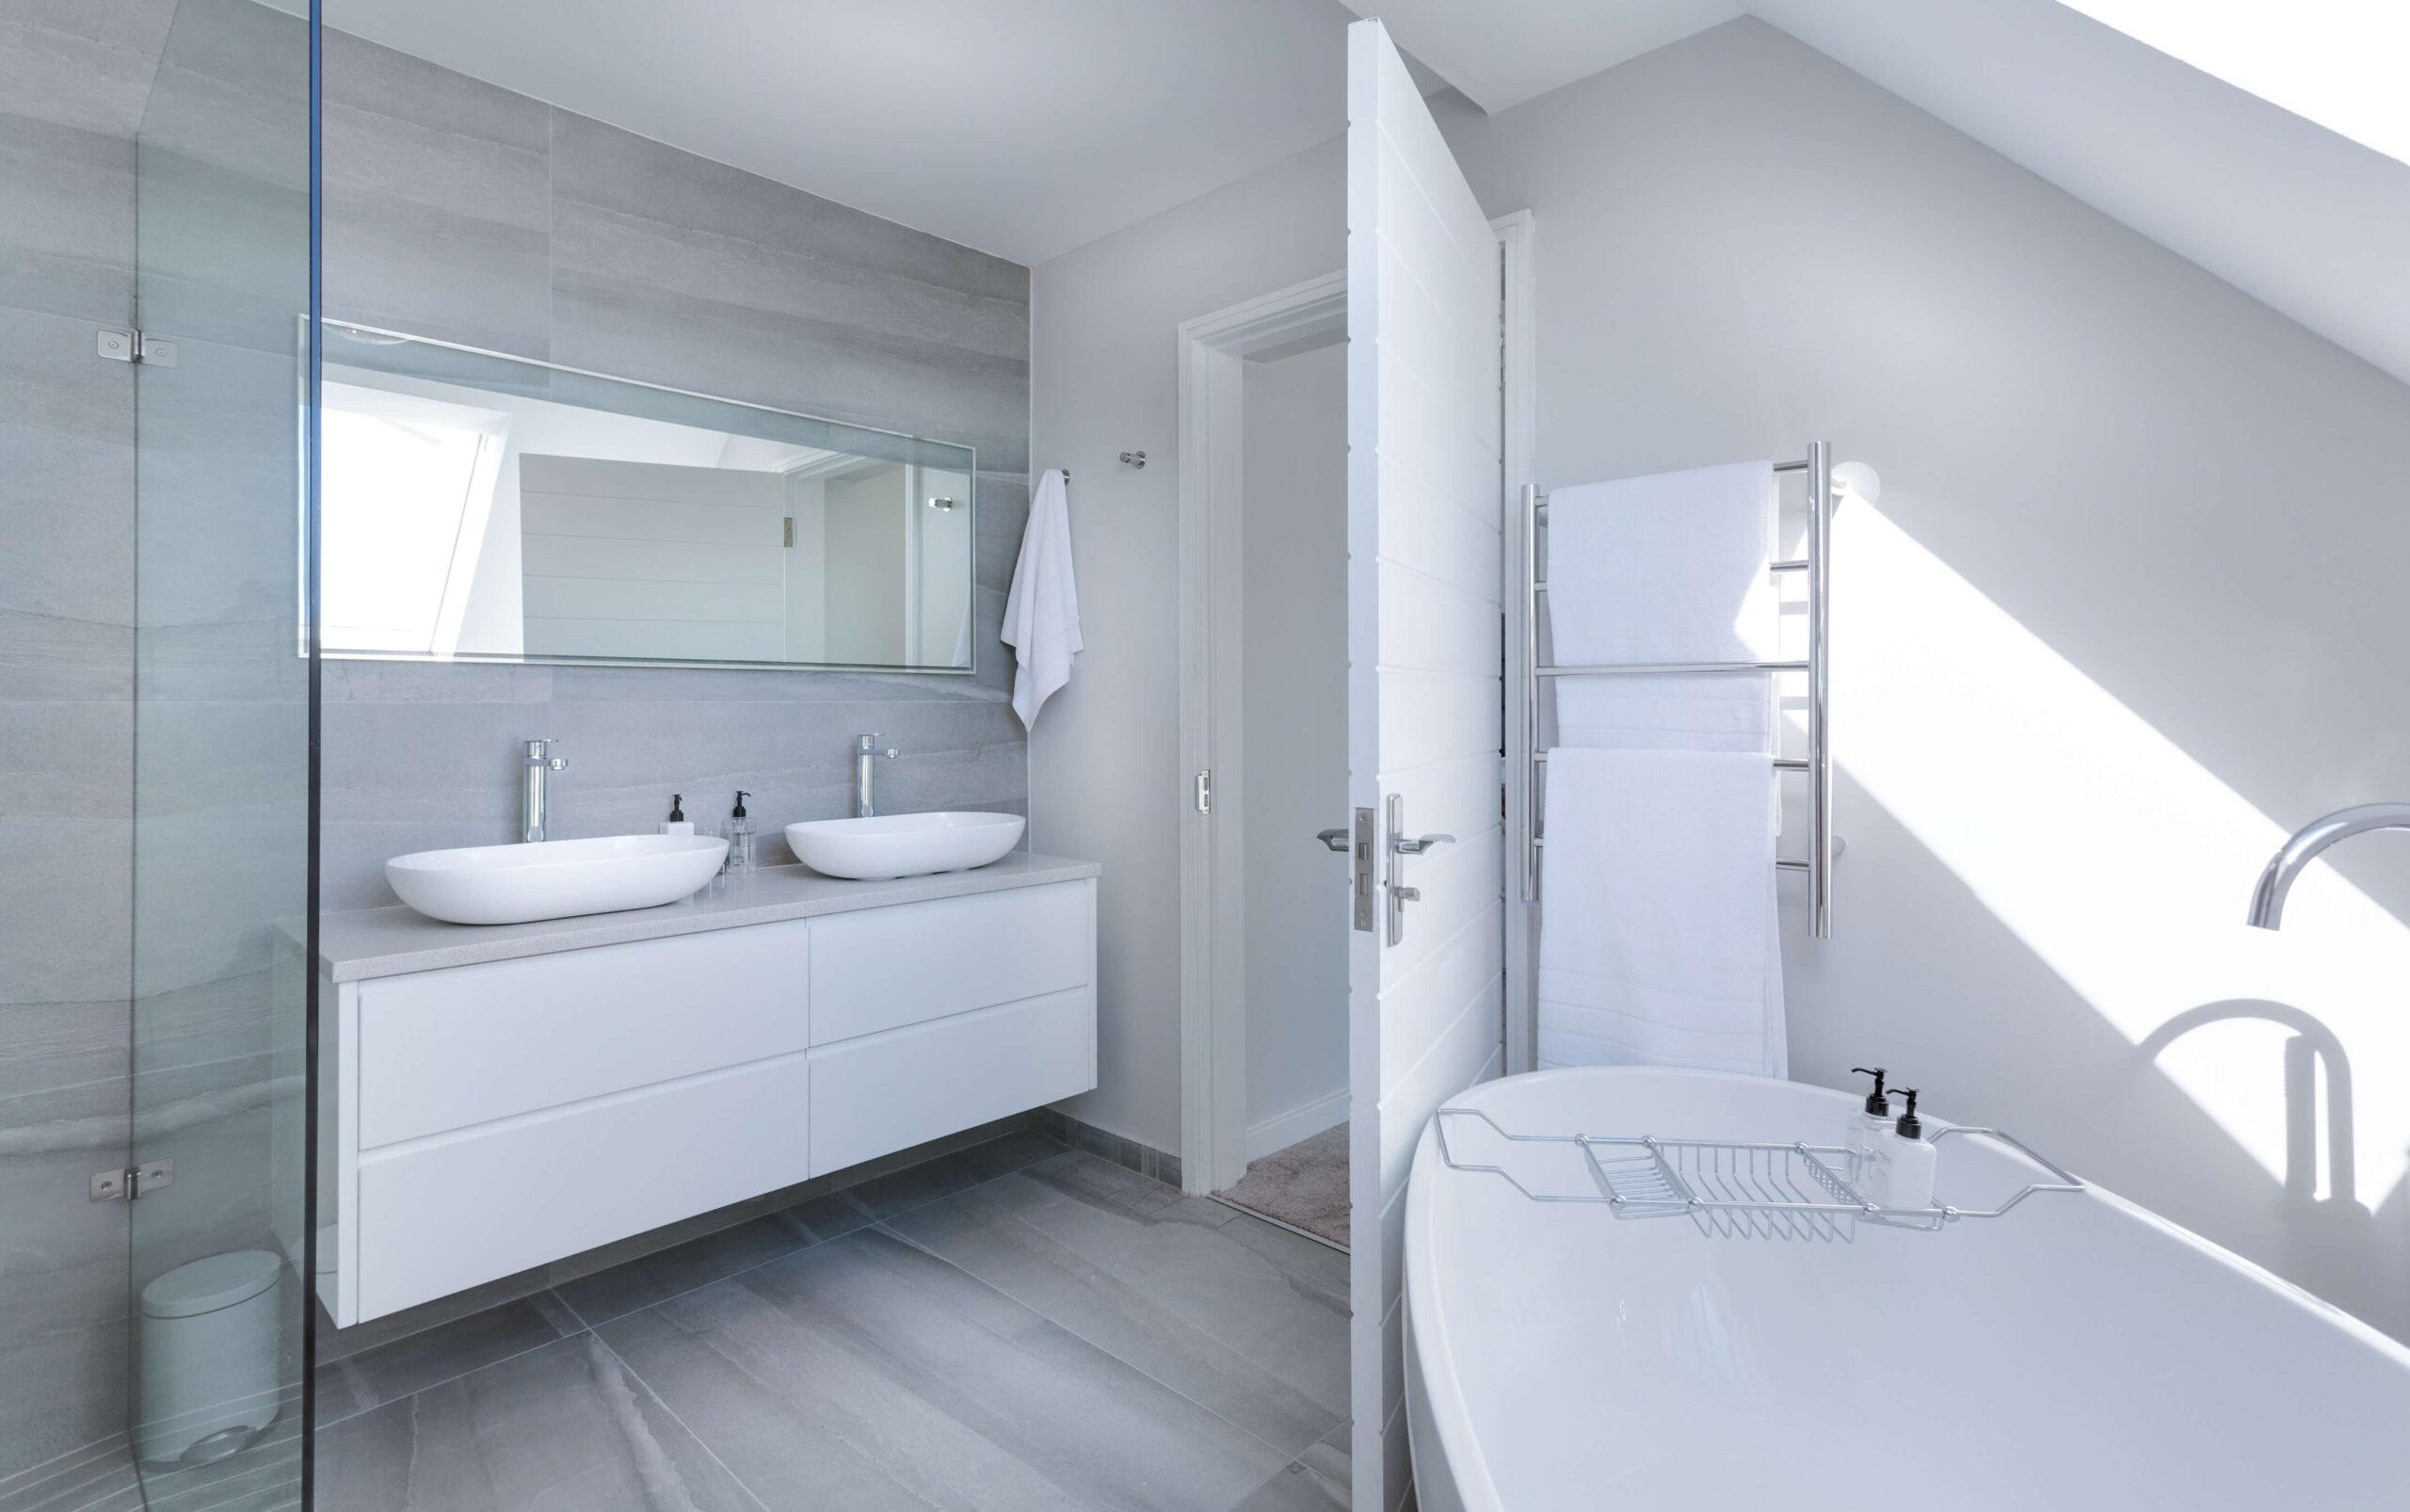 renovated bathroom perth